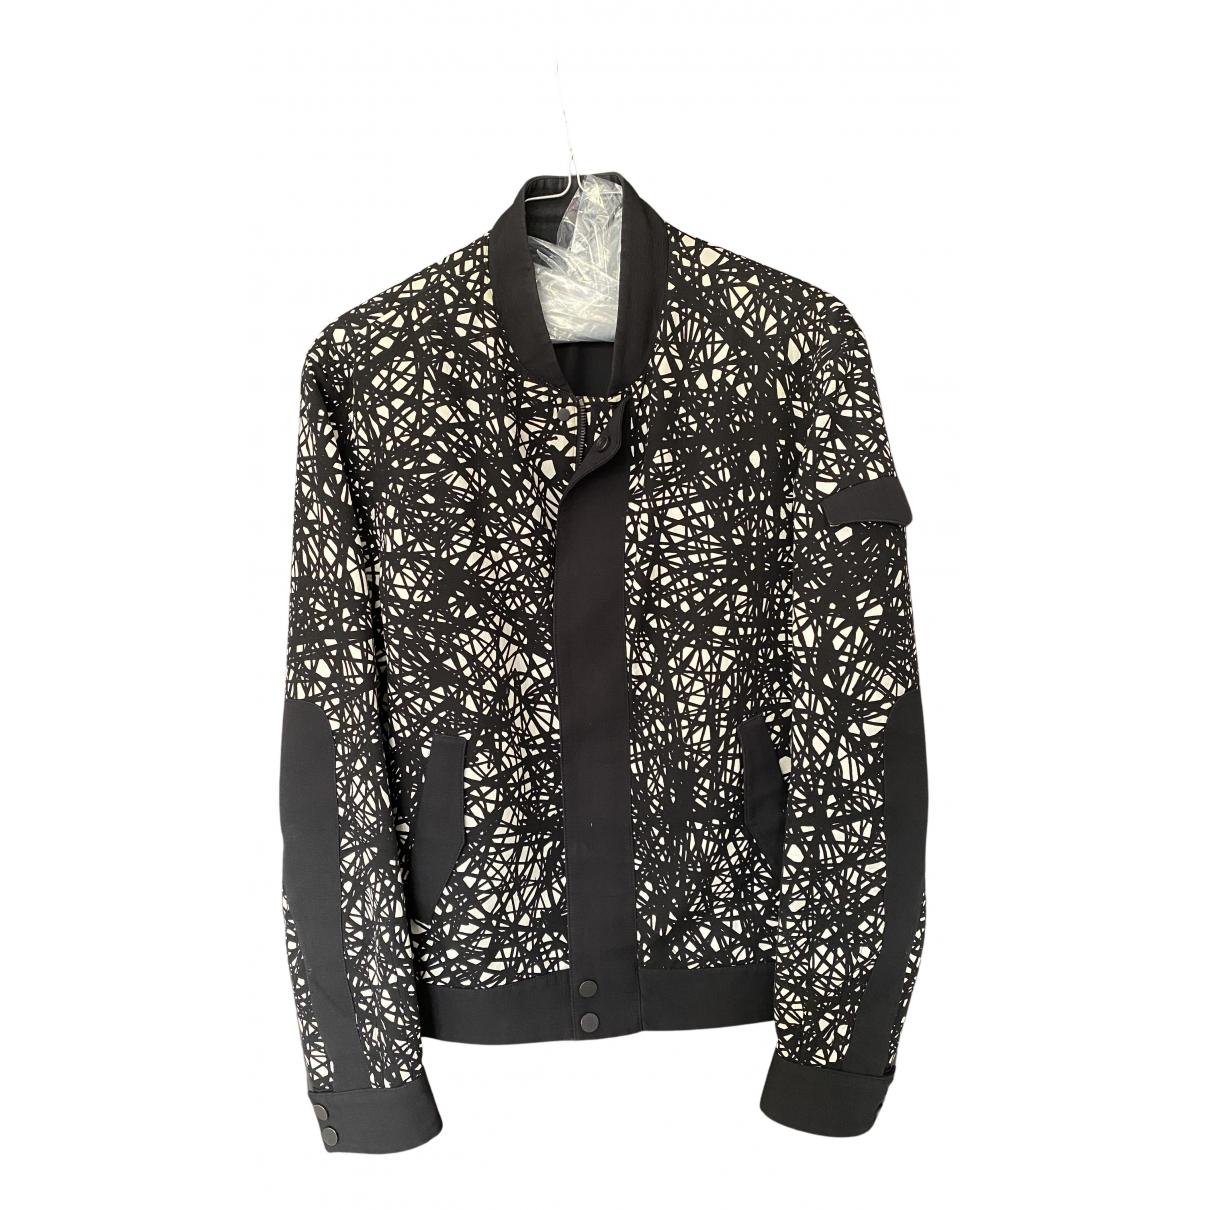 Balenciaga N Black Cotton jacket  for Men 46 FR